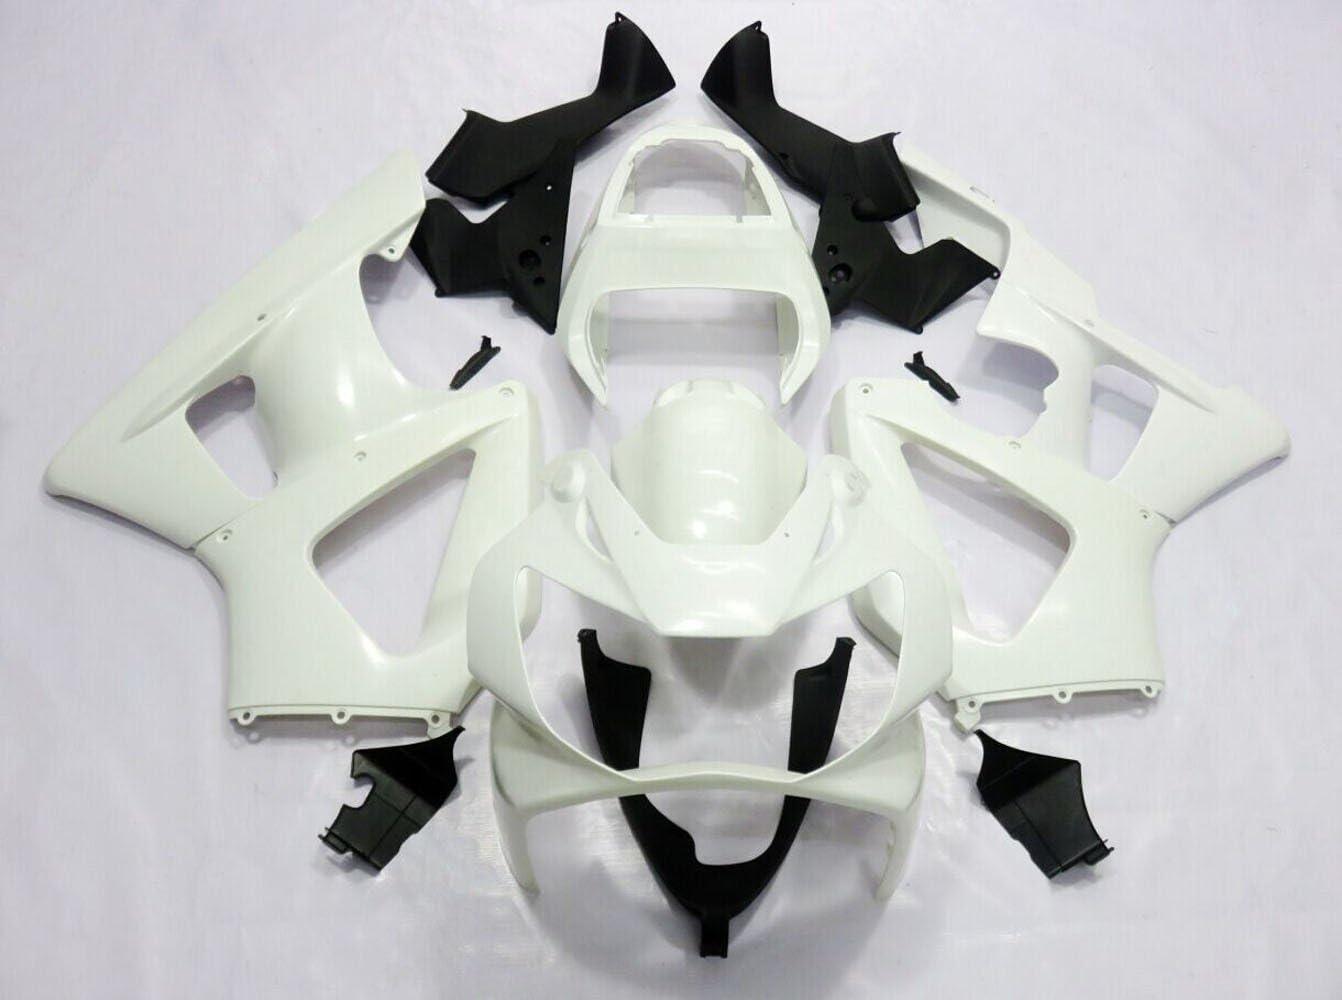 2000 2001 Unpainted Injection Fairing Kit for Honda CBR929RR CBR900RR ABS Plastic Motorcycle Bodywork